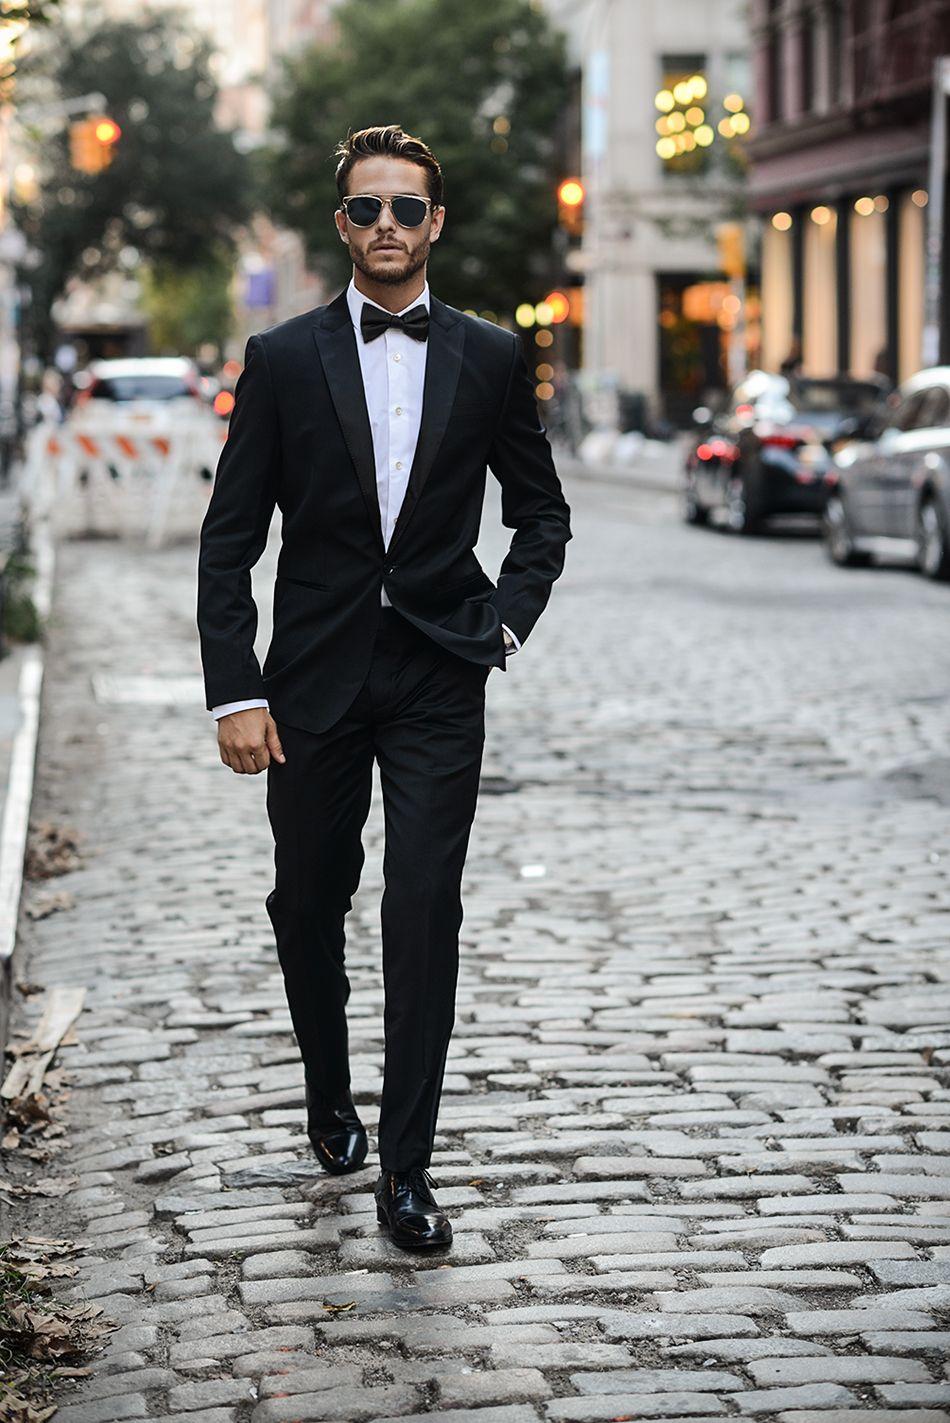 Express Affair Galla Men S Apparel Black Tie Dress Code